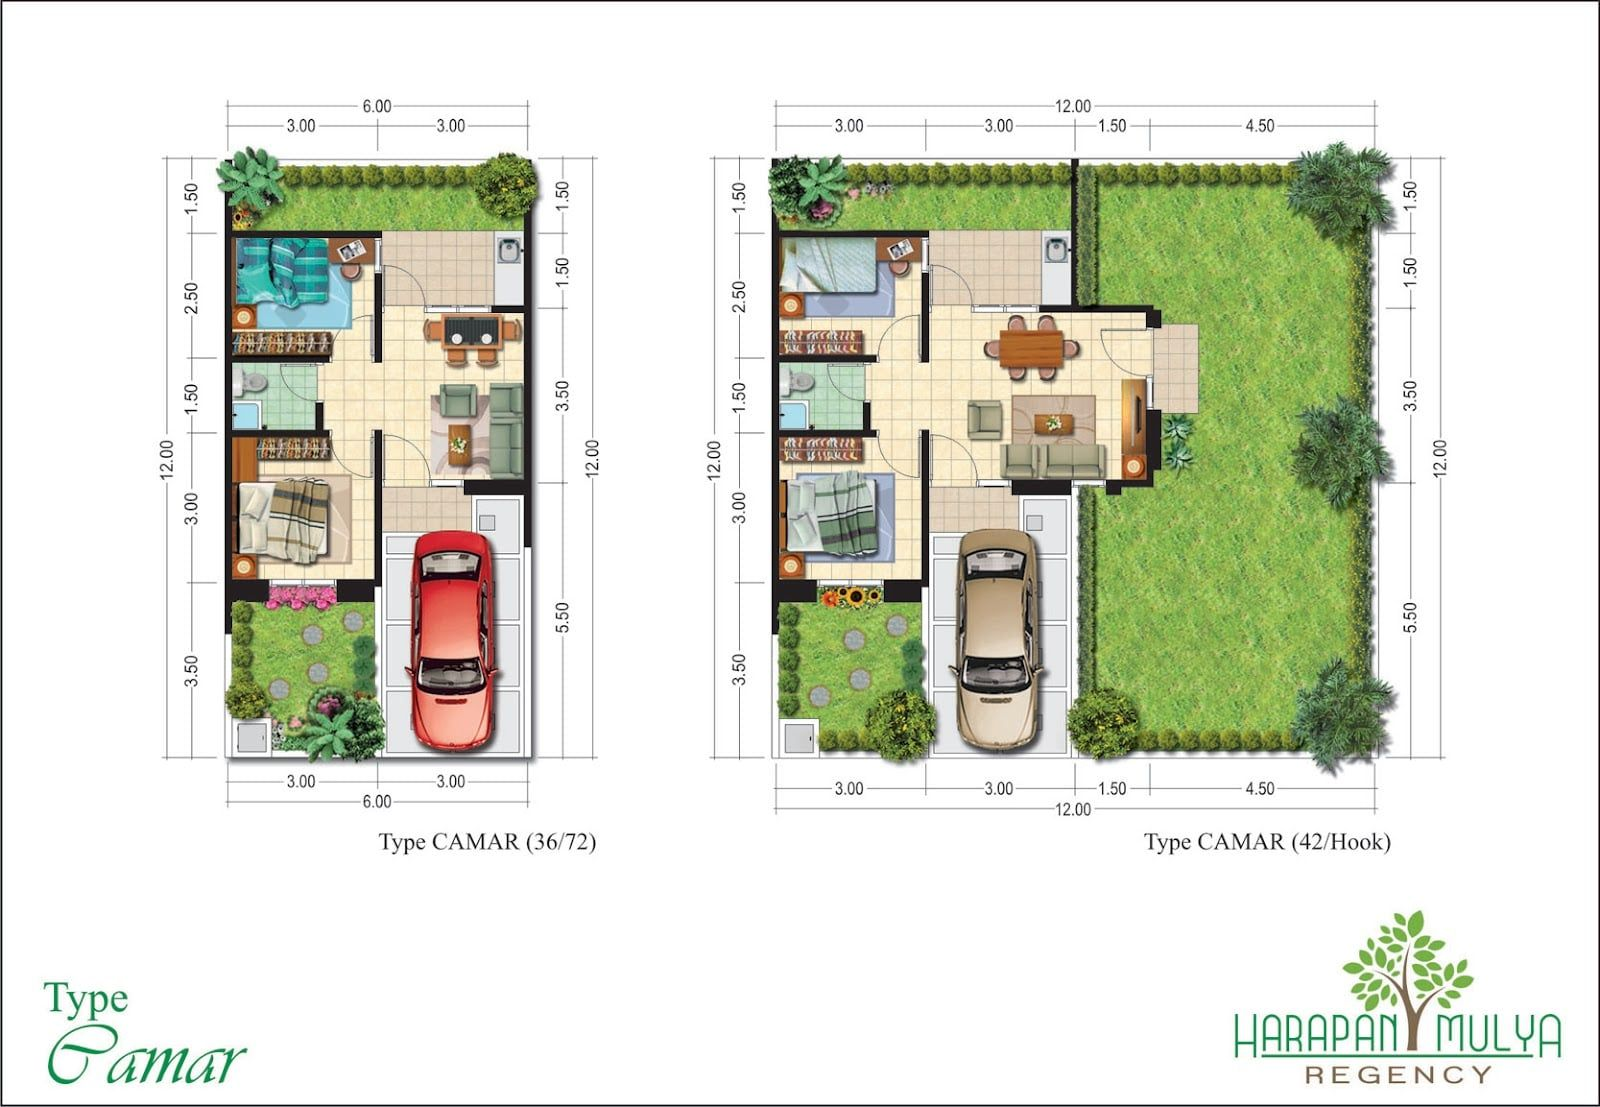 Desain Rumah Minimalis 2 Lantai Type 36 90 - Content